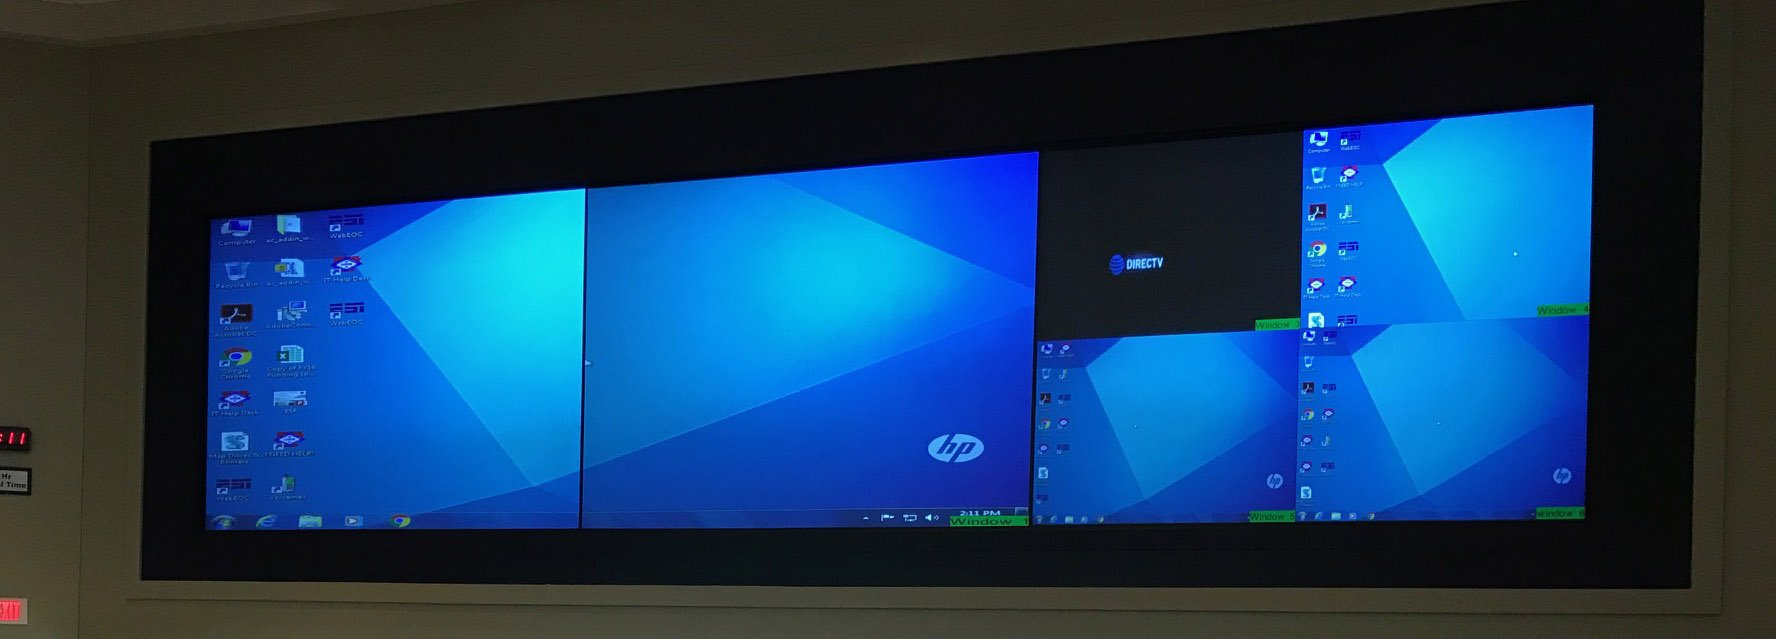 Three Digital Projection Projectors-Rear Screen